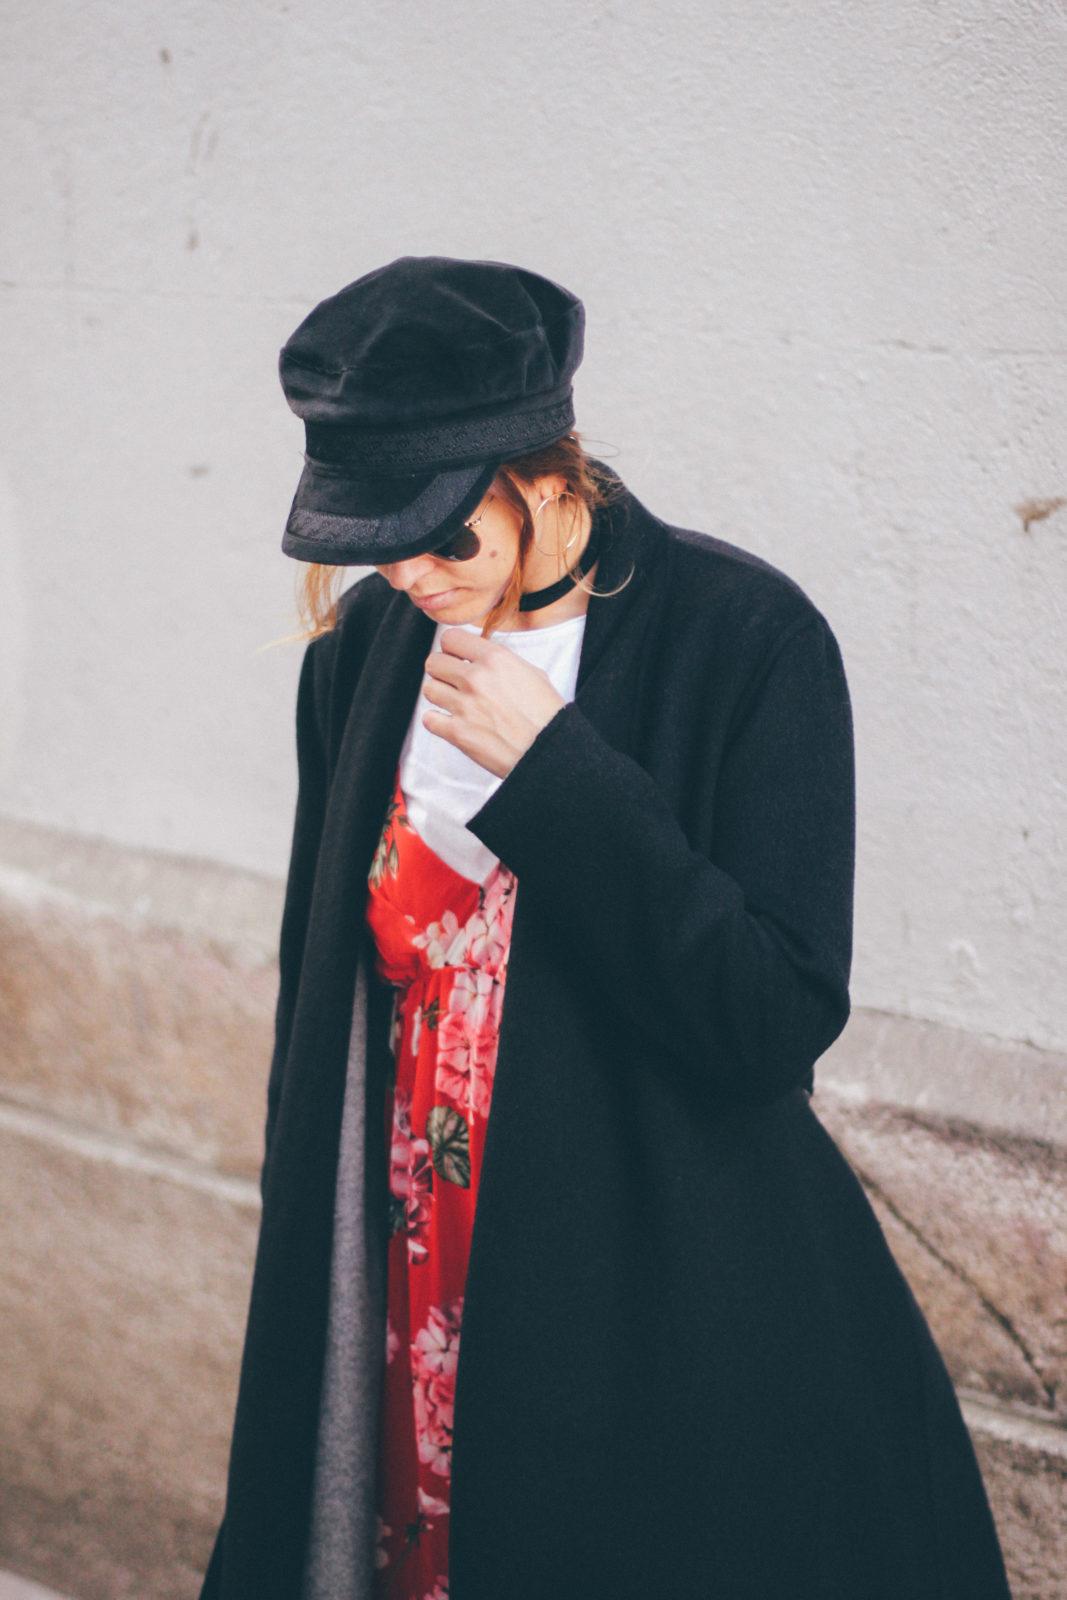 baker_boy_hat_vestido_con_camiseta_gorra_marinera_botines_hebillas_fall_2016_trends_street_style_outfits_donkeycool-14